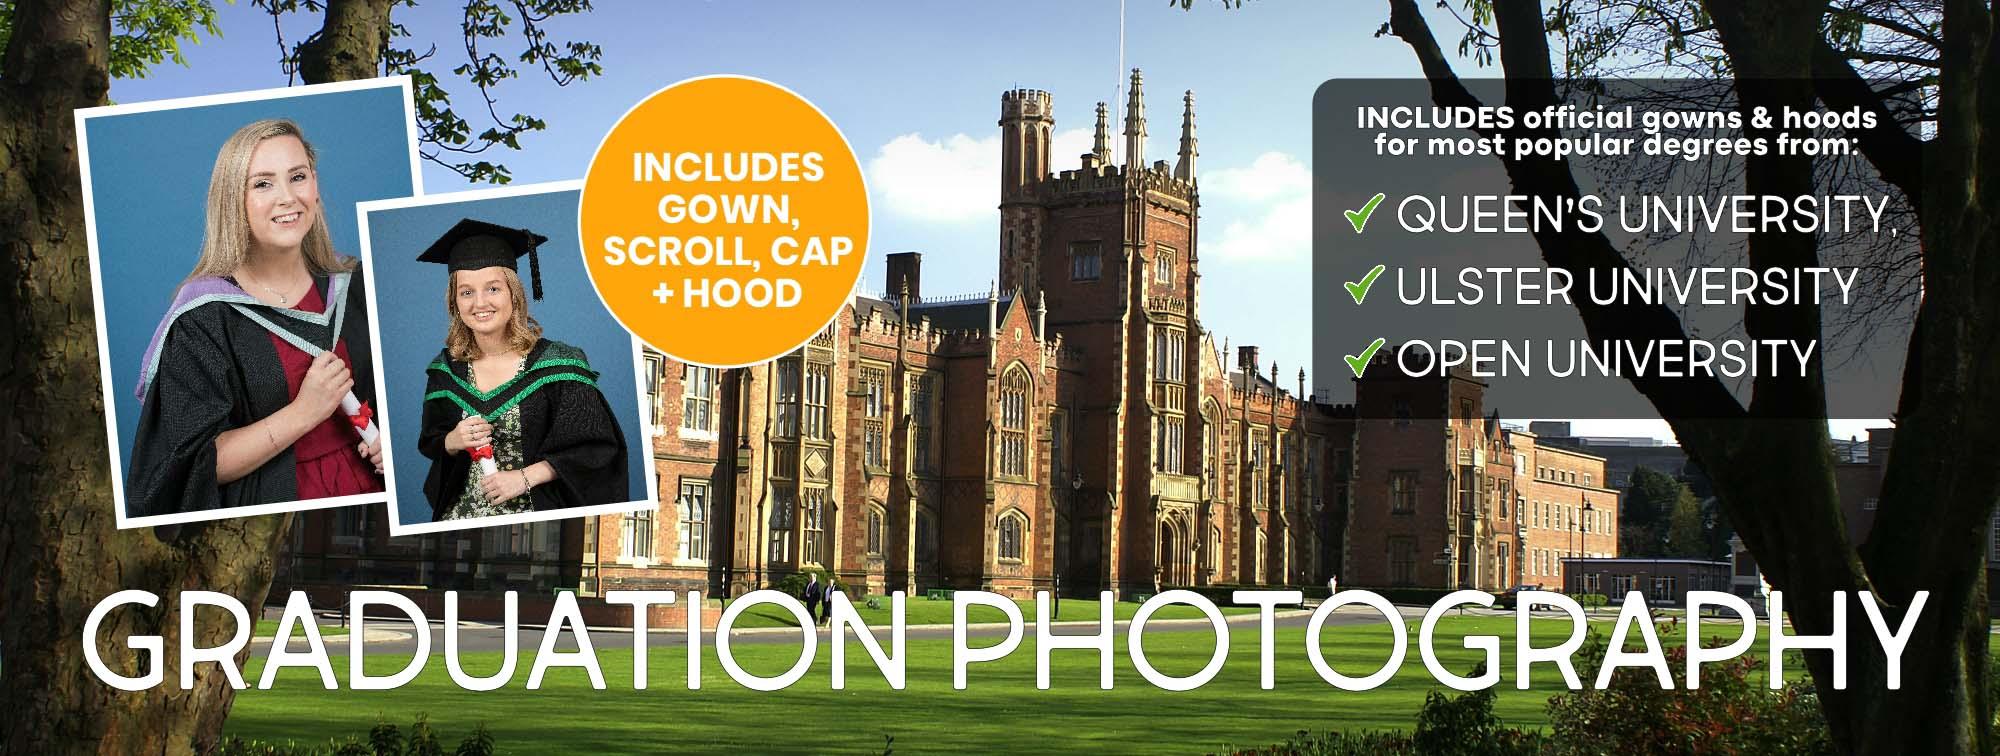 Graduation Photography for Queen's University Belfast, University of Ulster and Open University